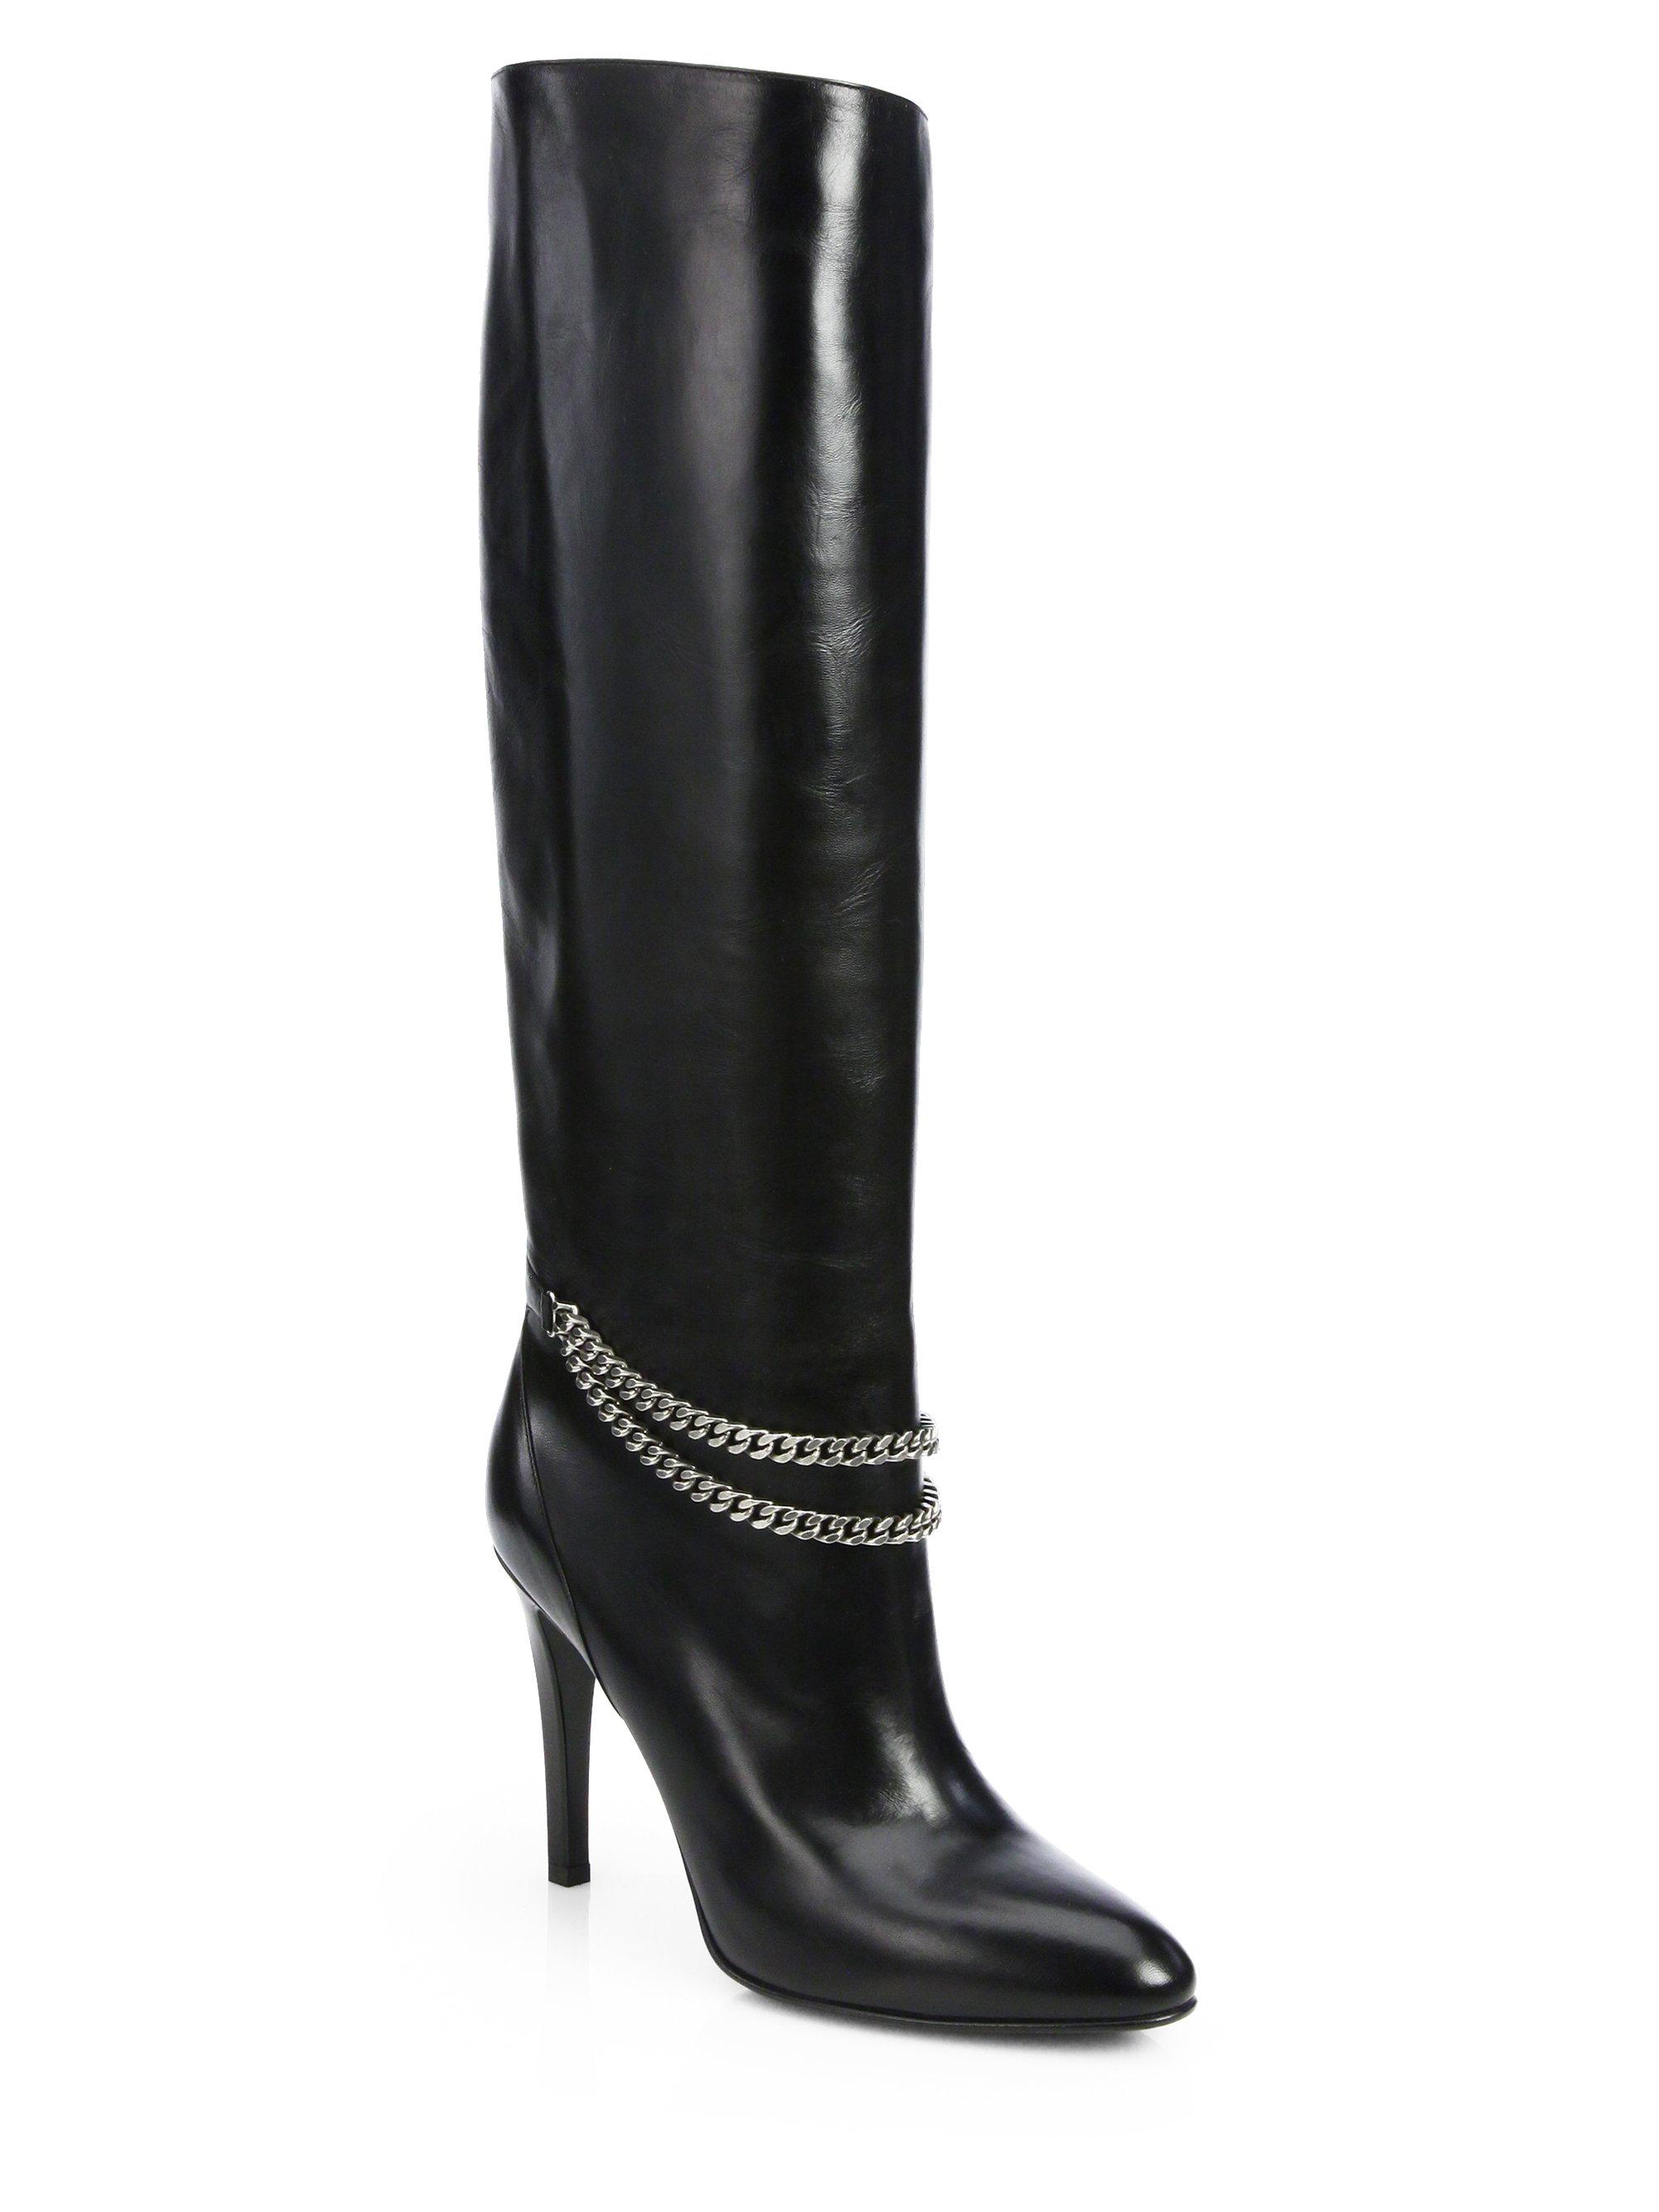 168a6f368d5 Saint Laurent Debbie Chain-Detail Leather Knee-High Boots in Black ...